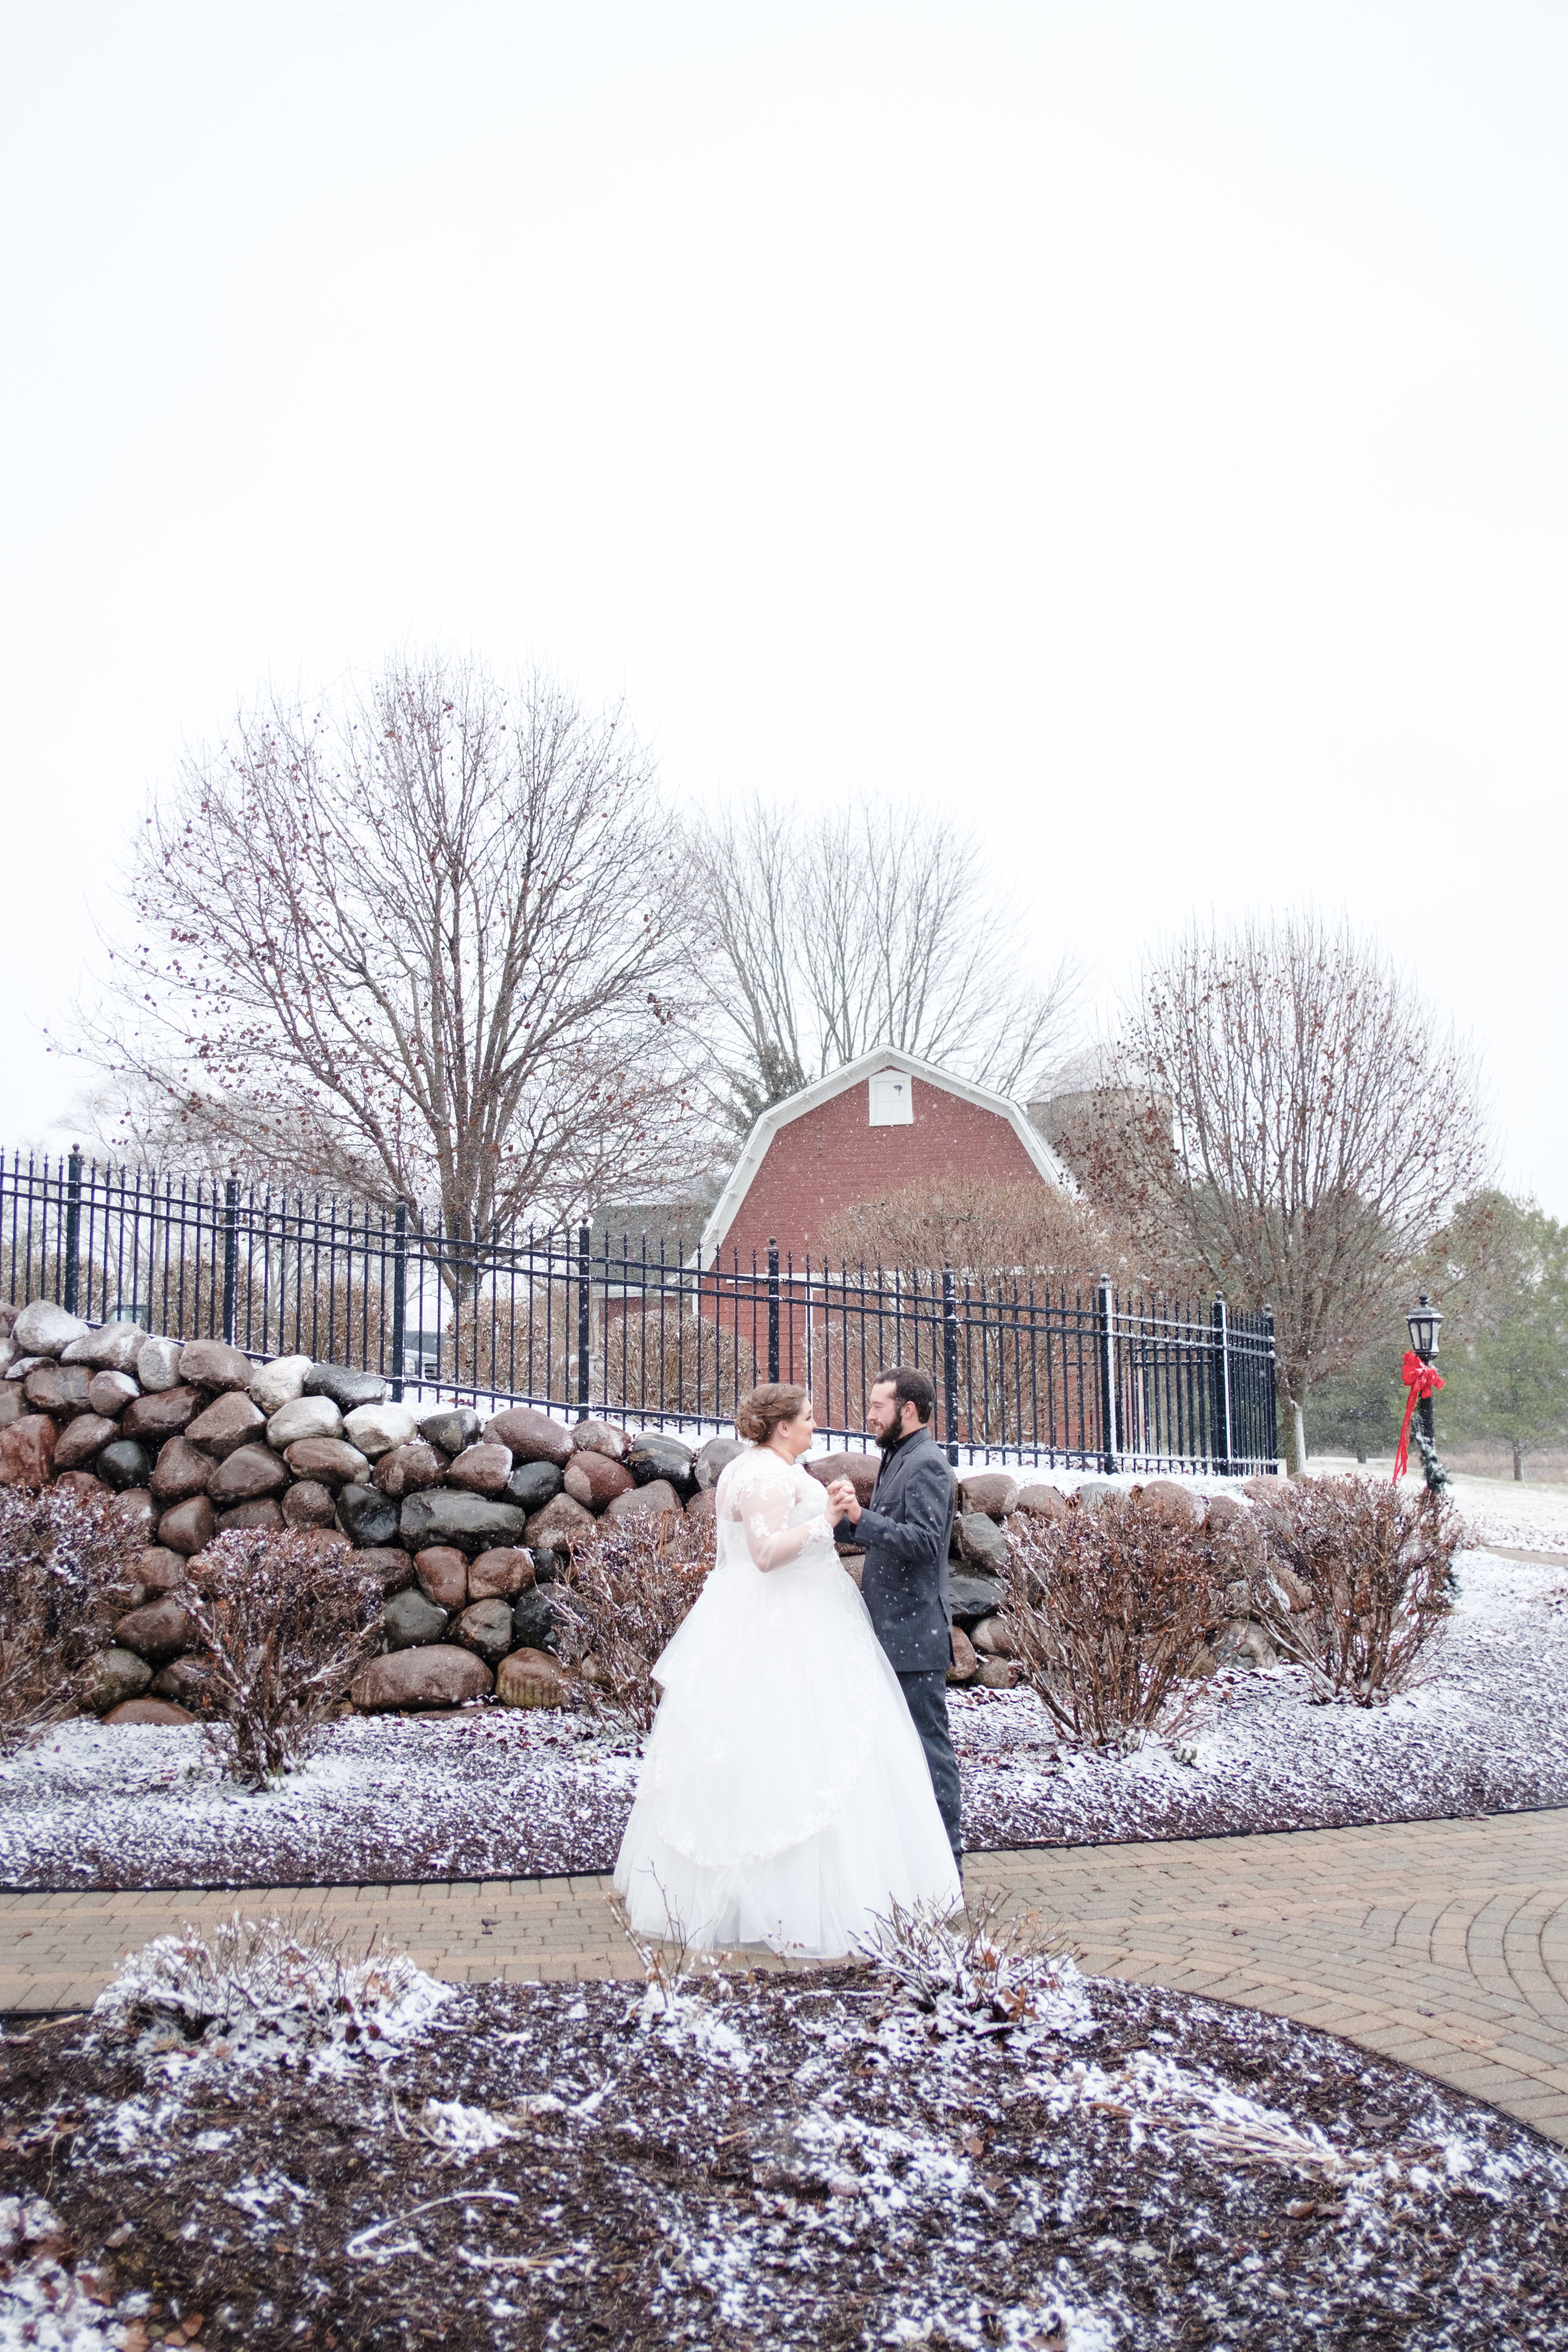 18-12-28 Corinne-Henry-Pavilion-Wedding-125.jpg